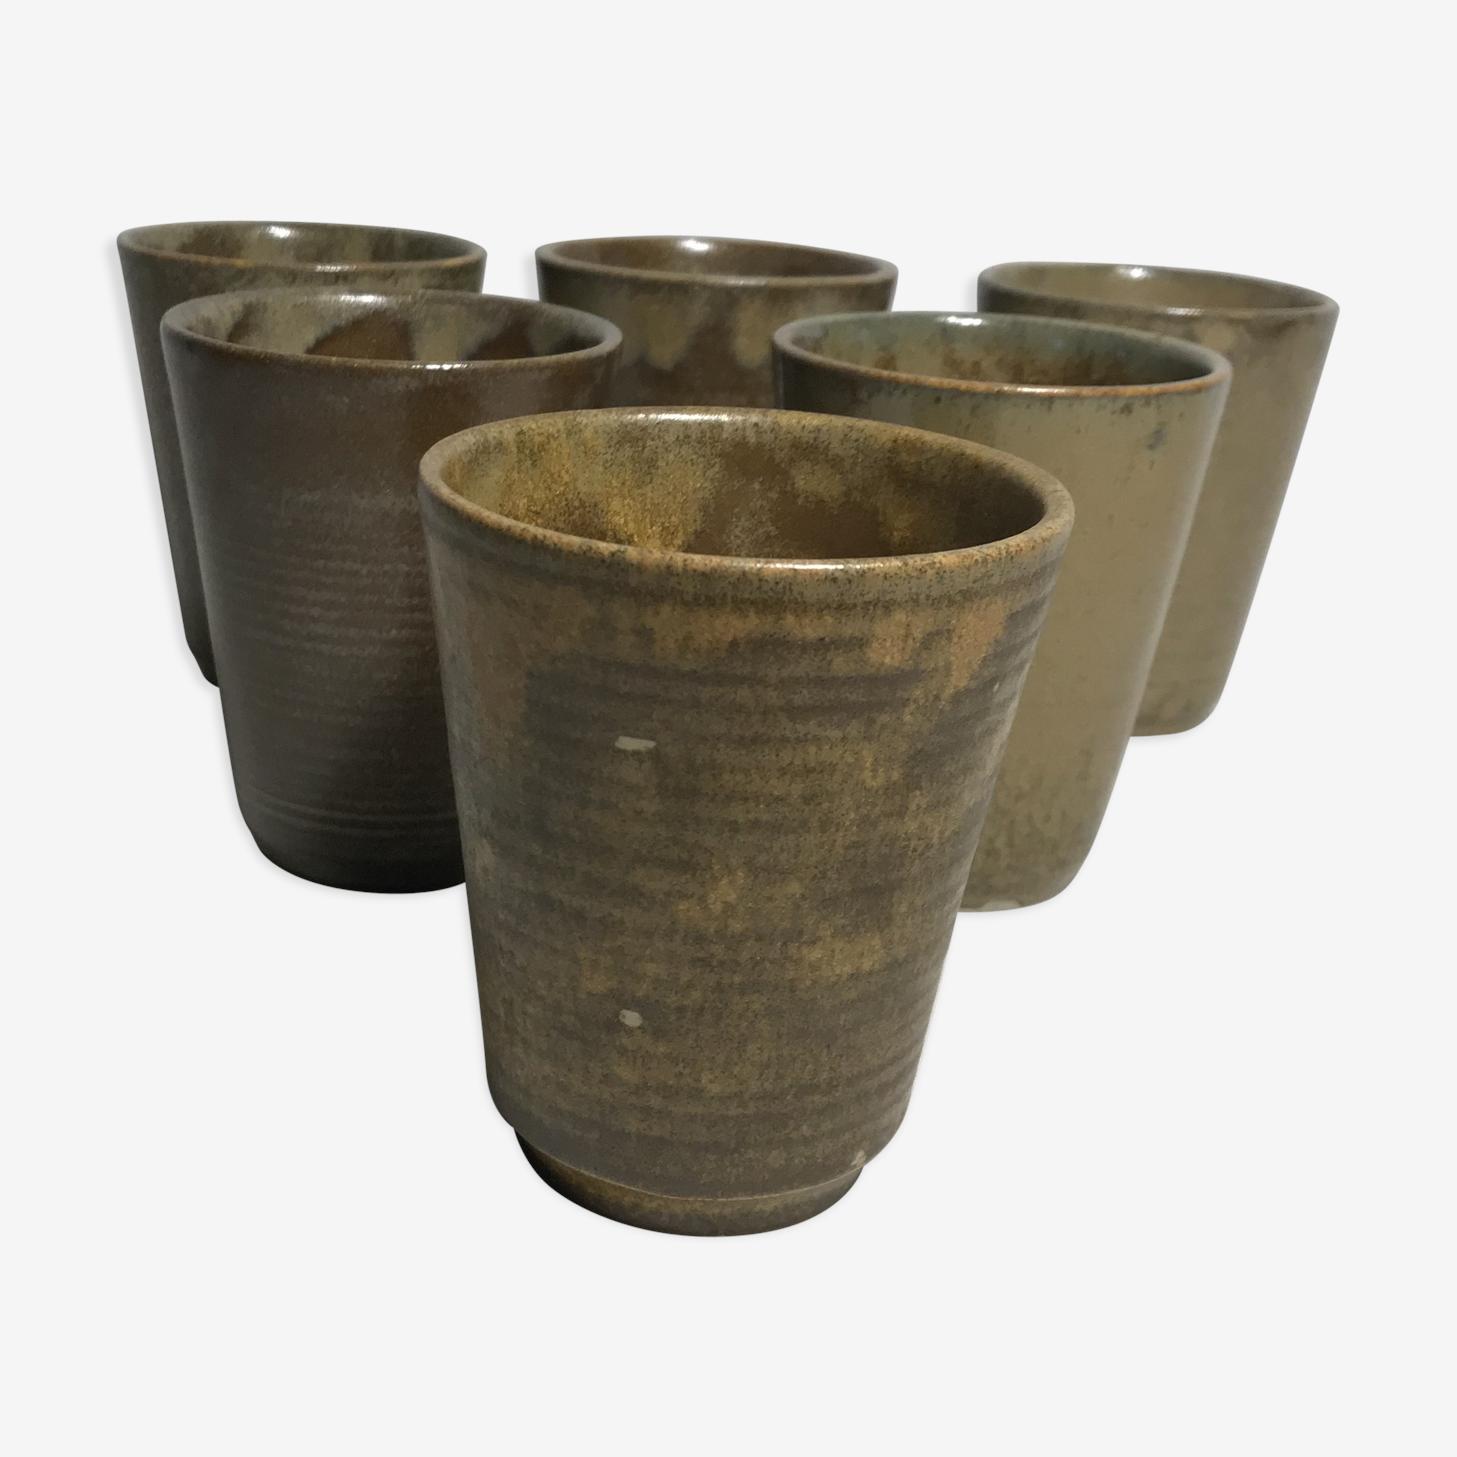 Série 6 tasses verres ancien grès Digoin Sarreguemines vintage